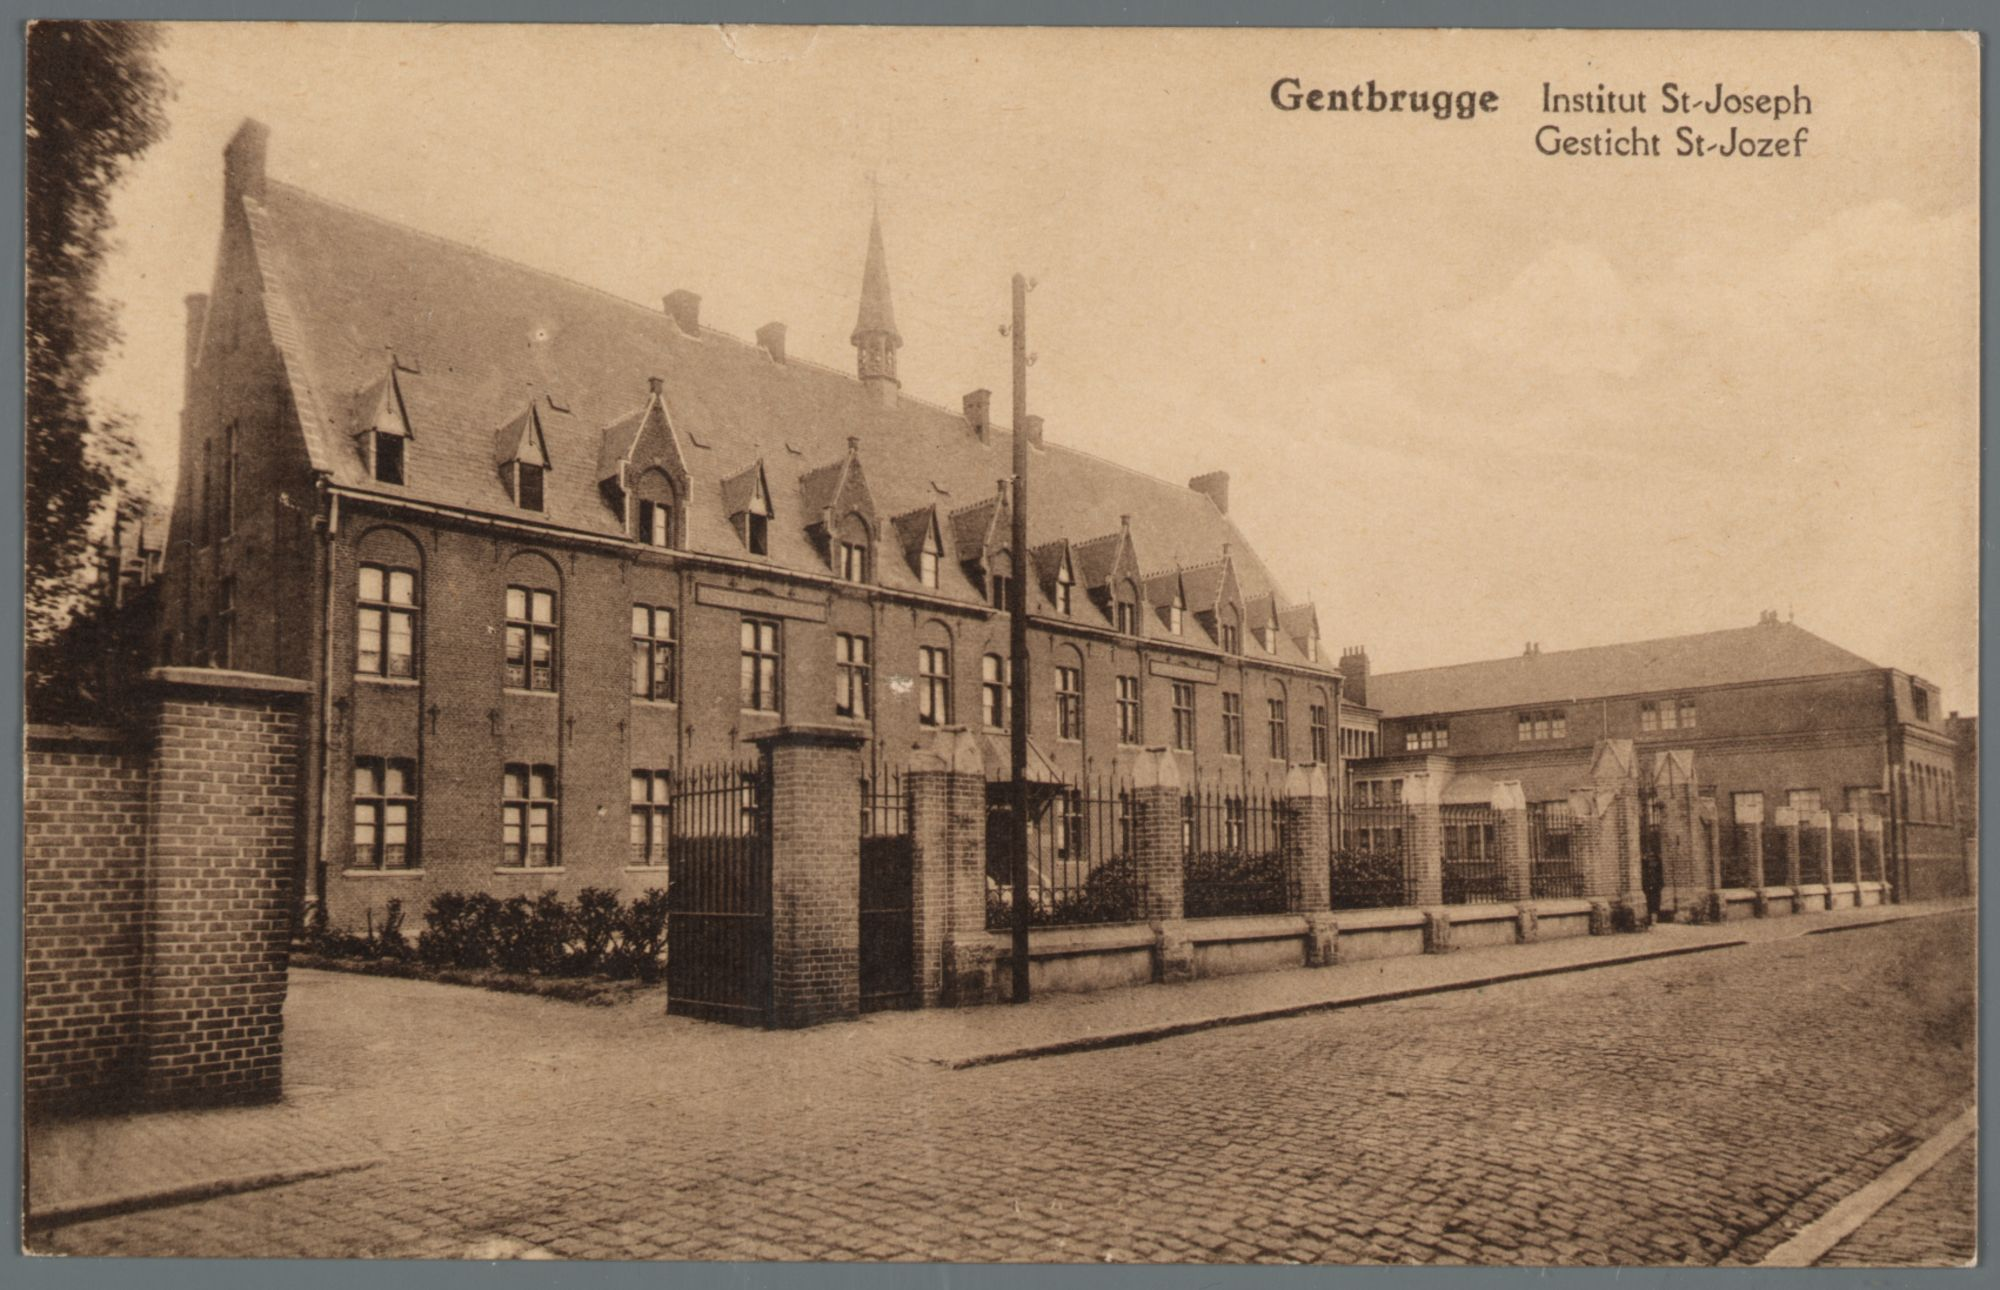 Gentbrugge: Sint-Jozefinstituut